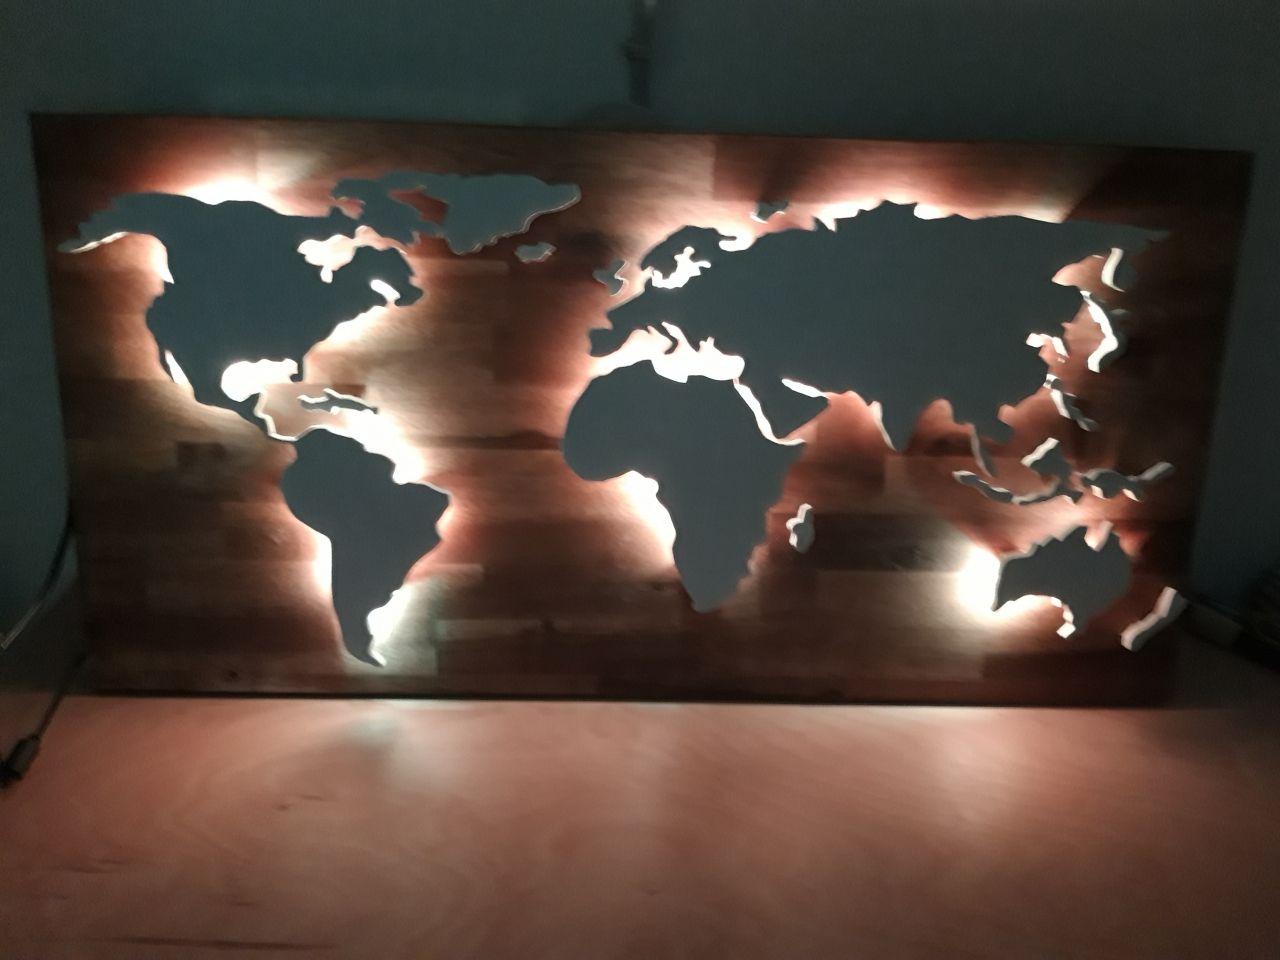 Weltkarte 3d Led Effekt Weltkarte Led Holzbearbeitungs Projekte